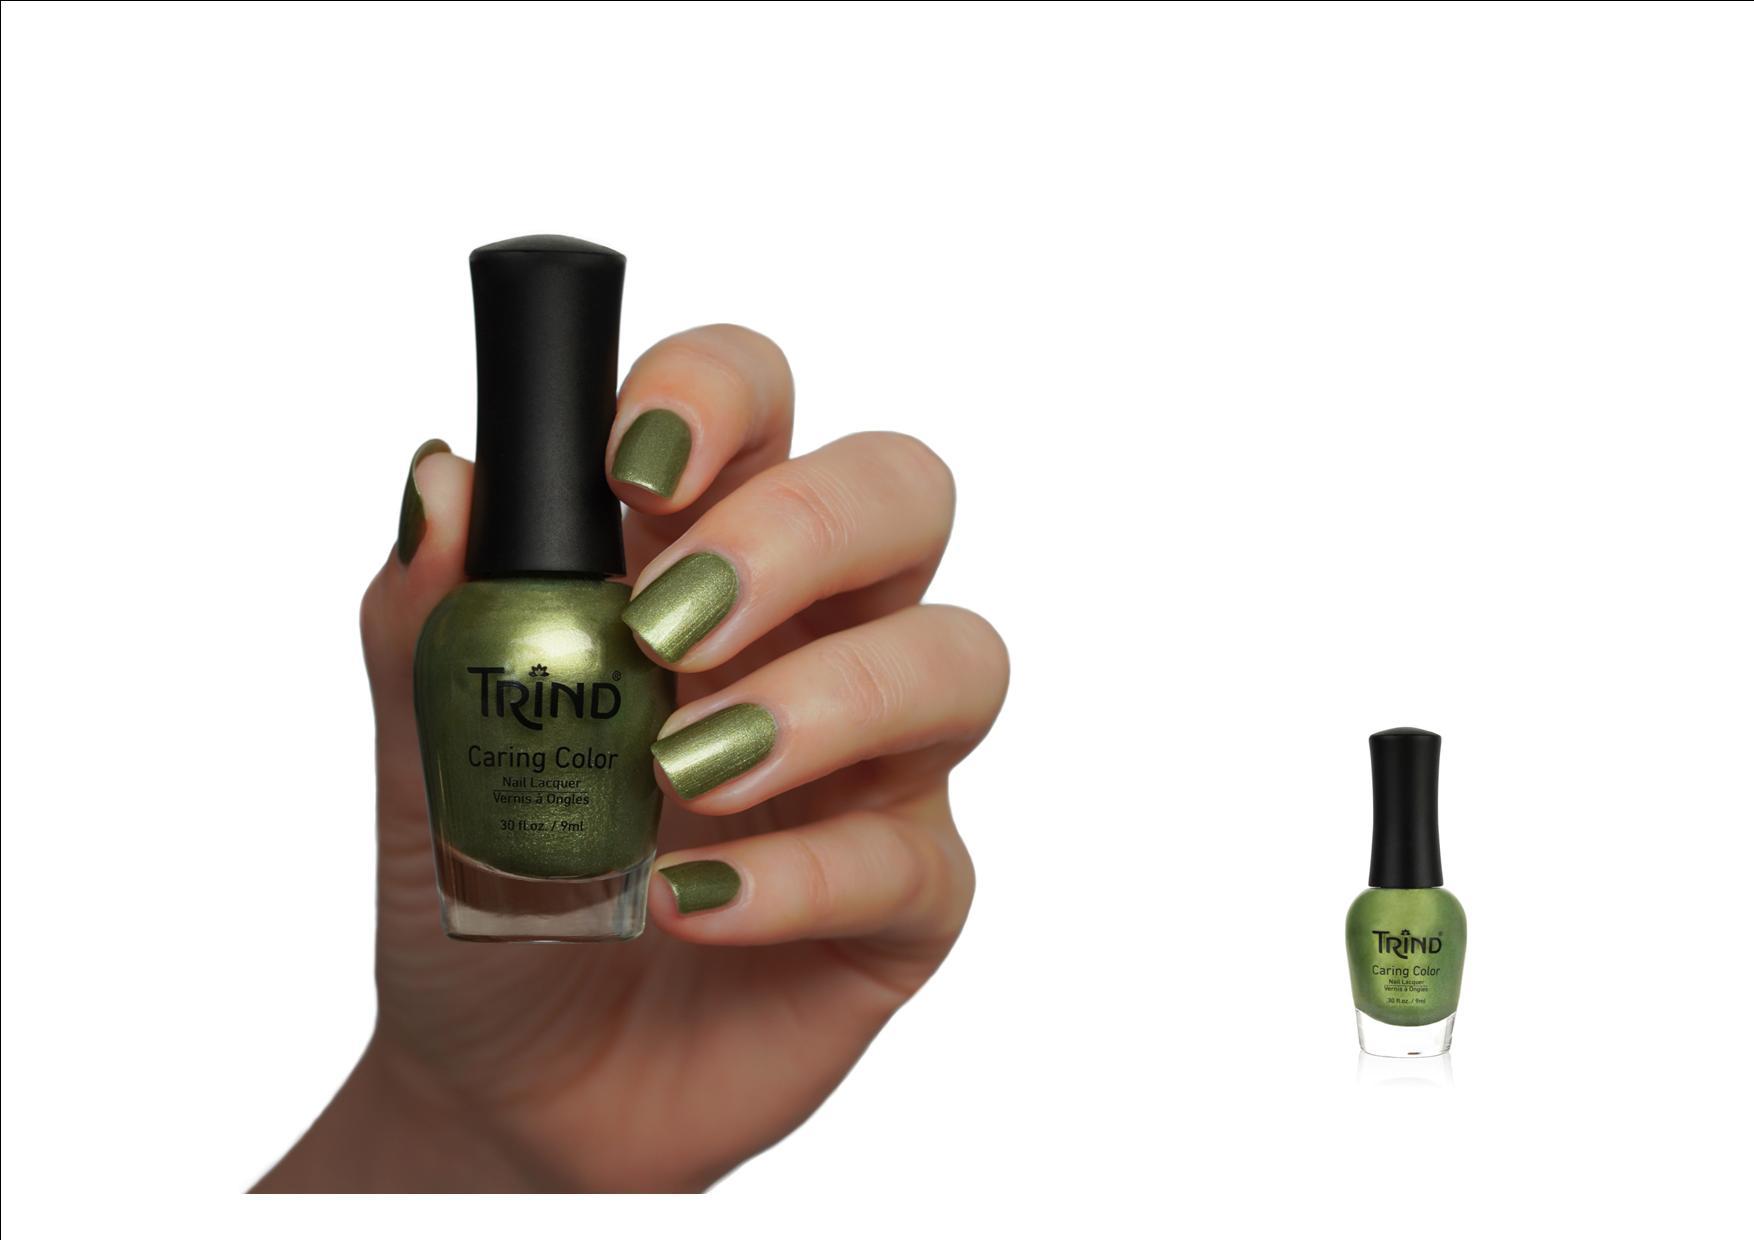 Trind Caring Color Nagellak Sparkling Moss 306 nieuwe voorjaar/zomer kleur 2020